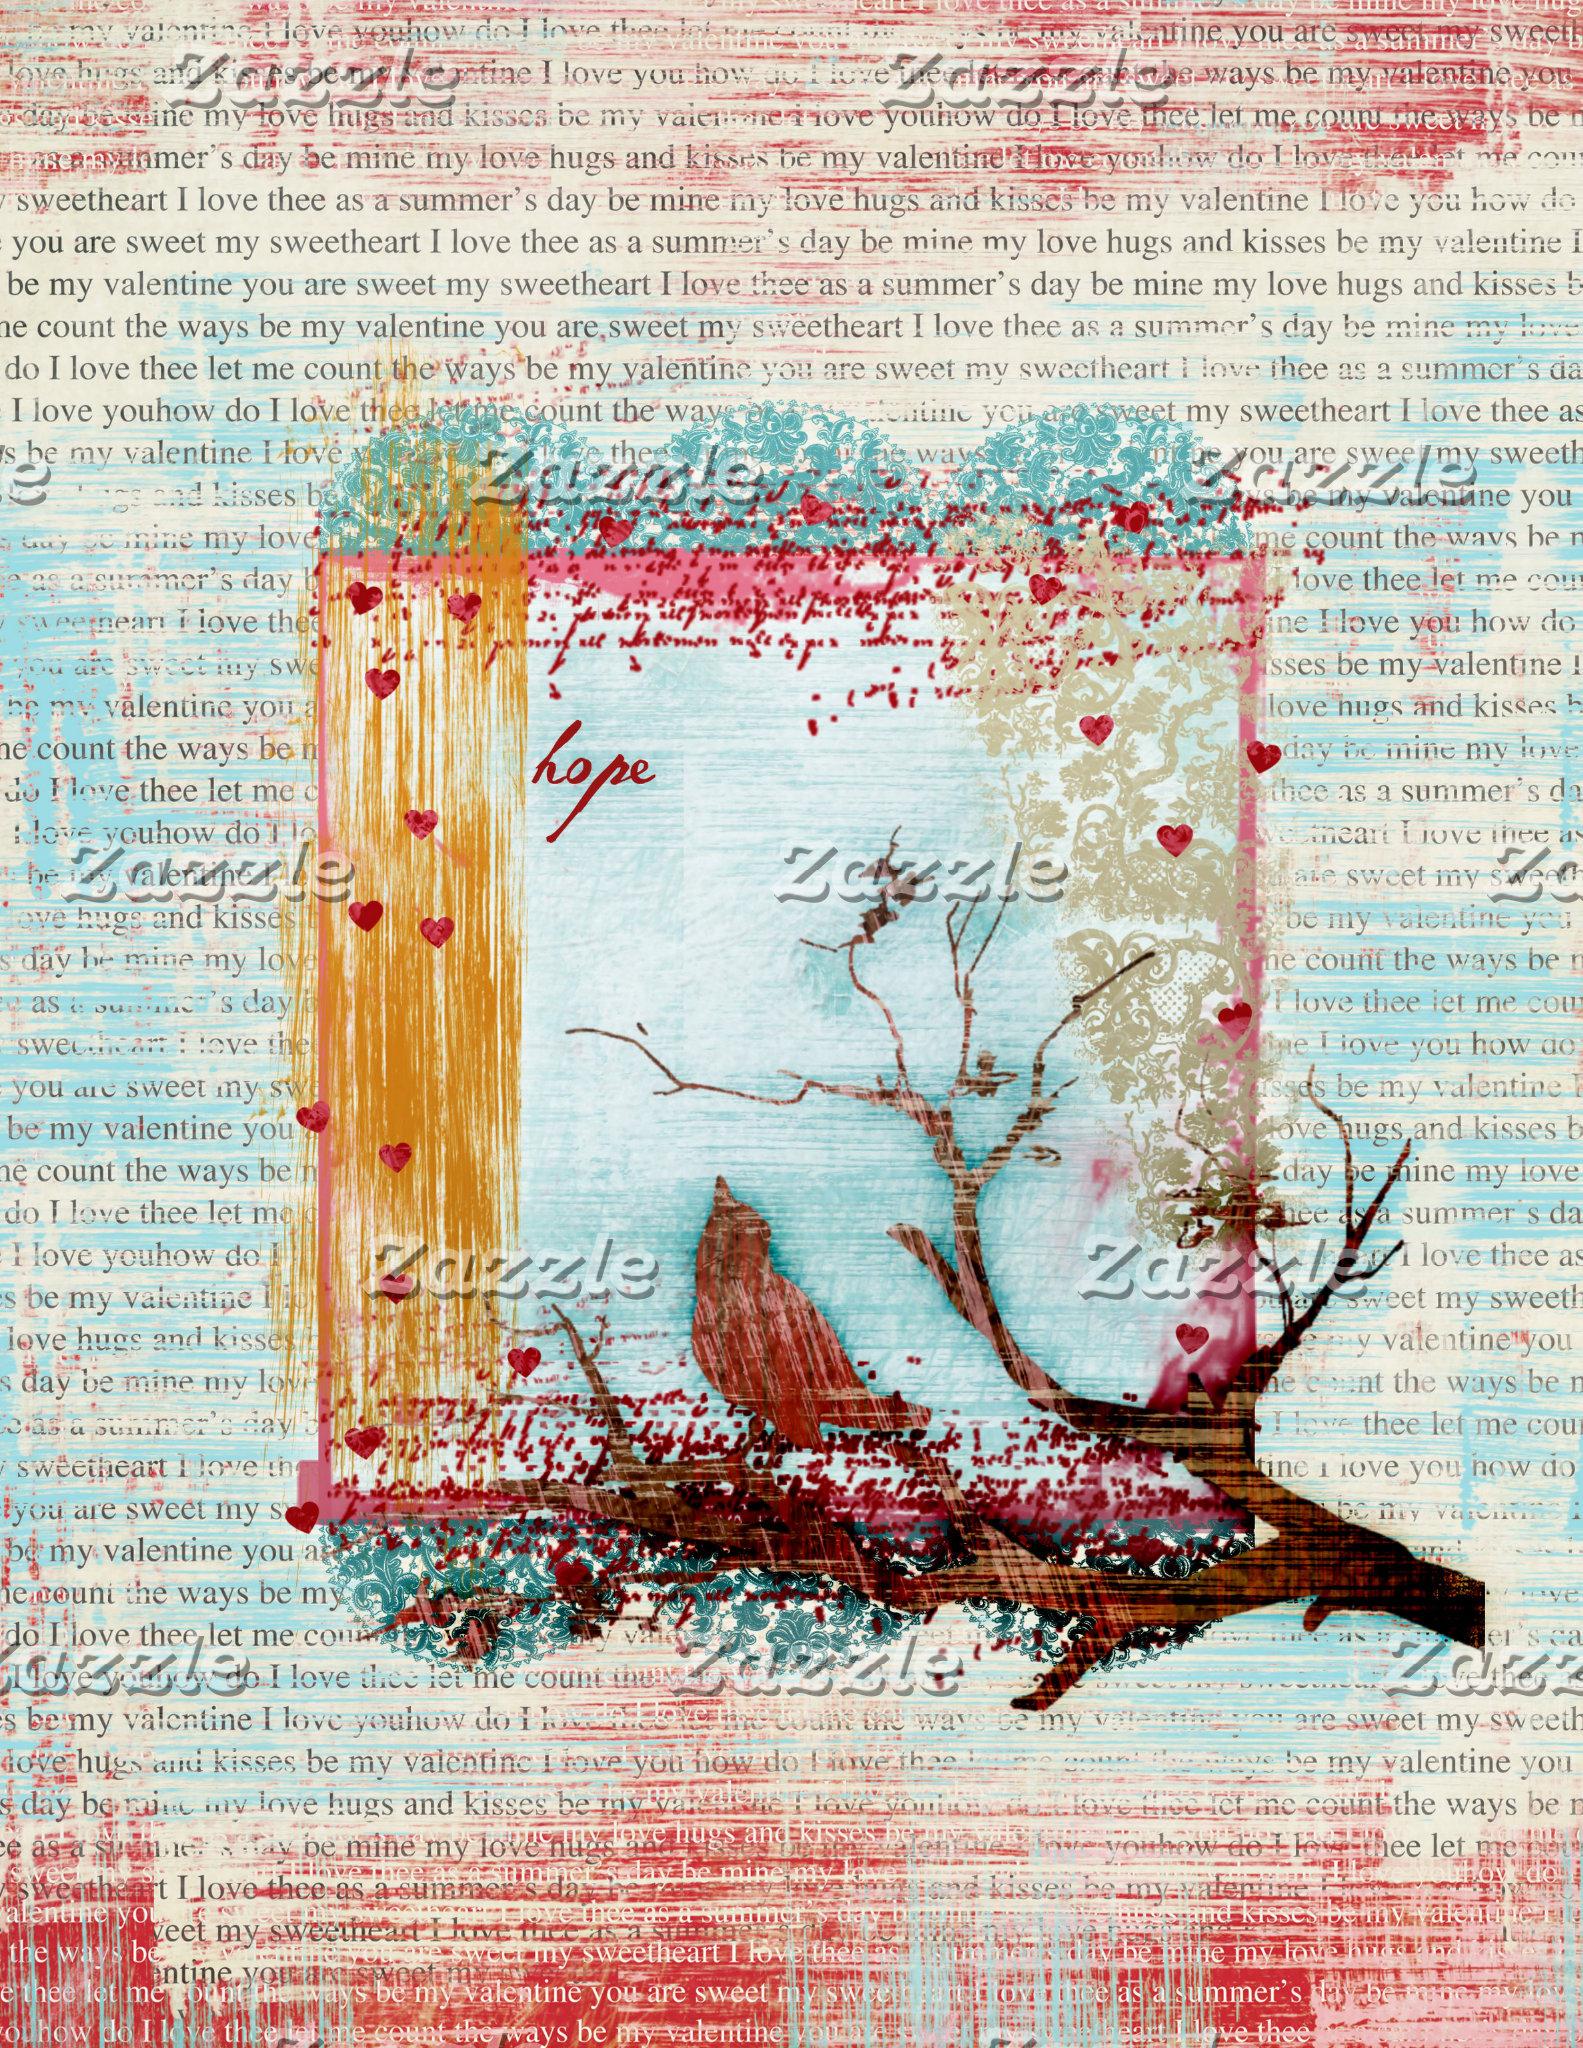 Hope & Imagine, The Birds